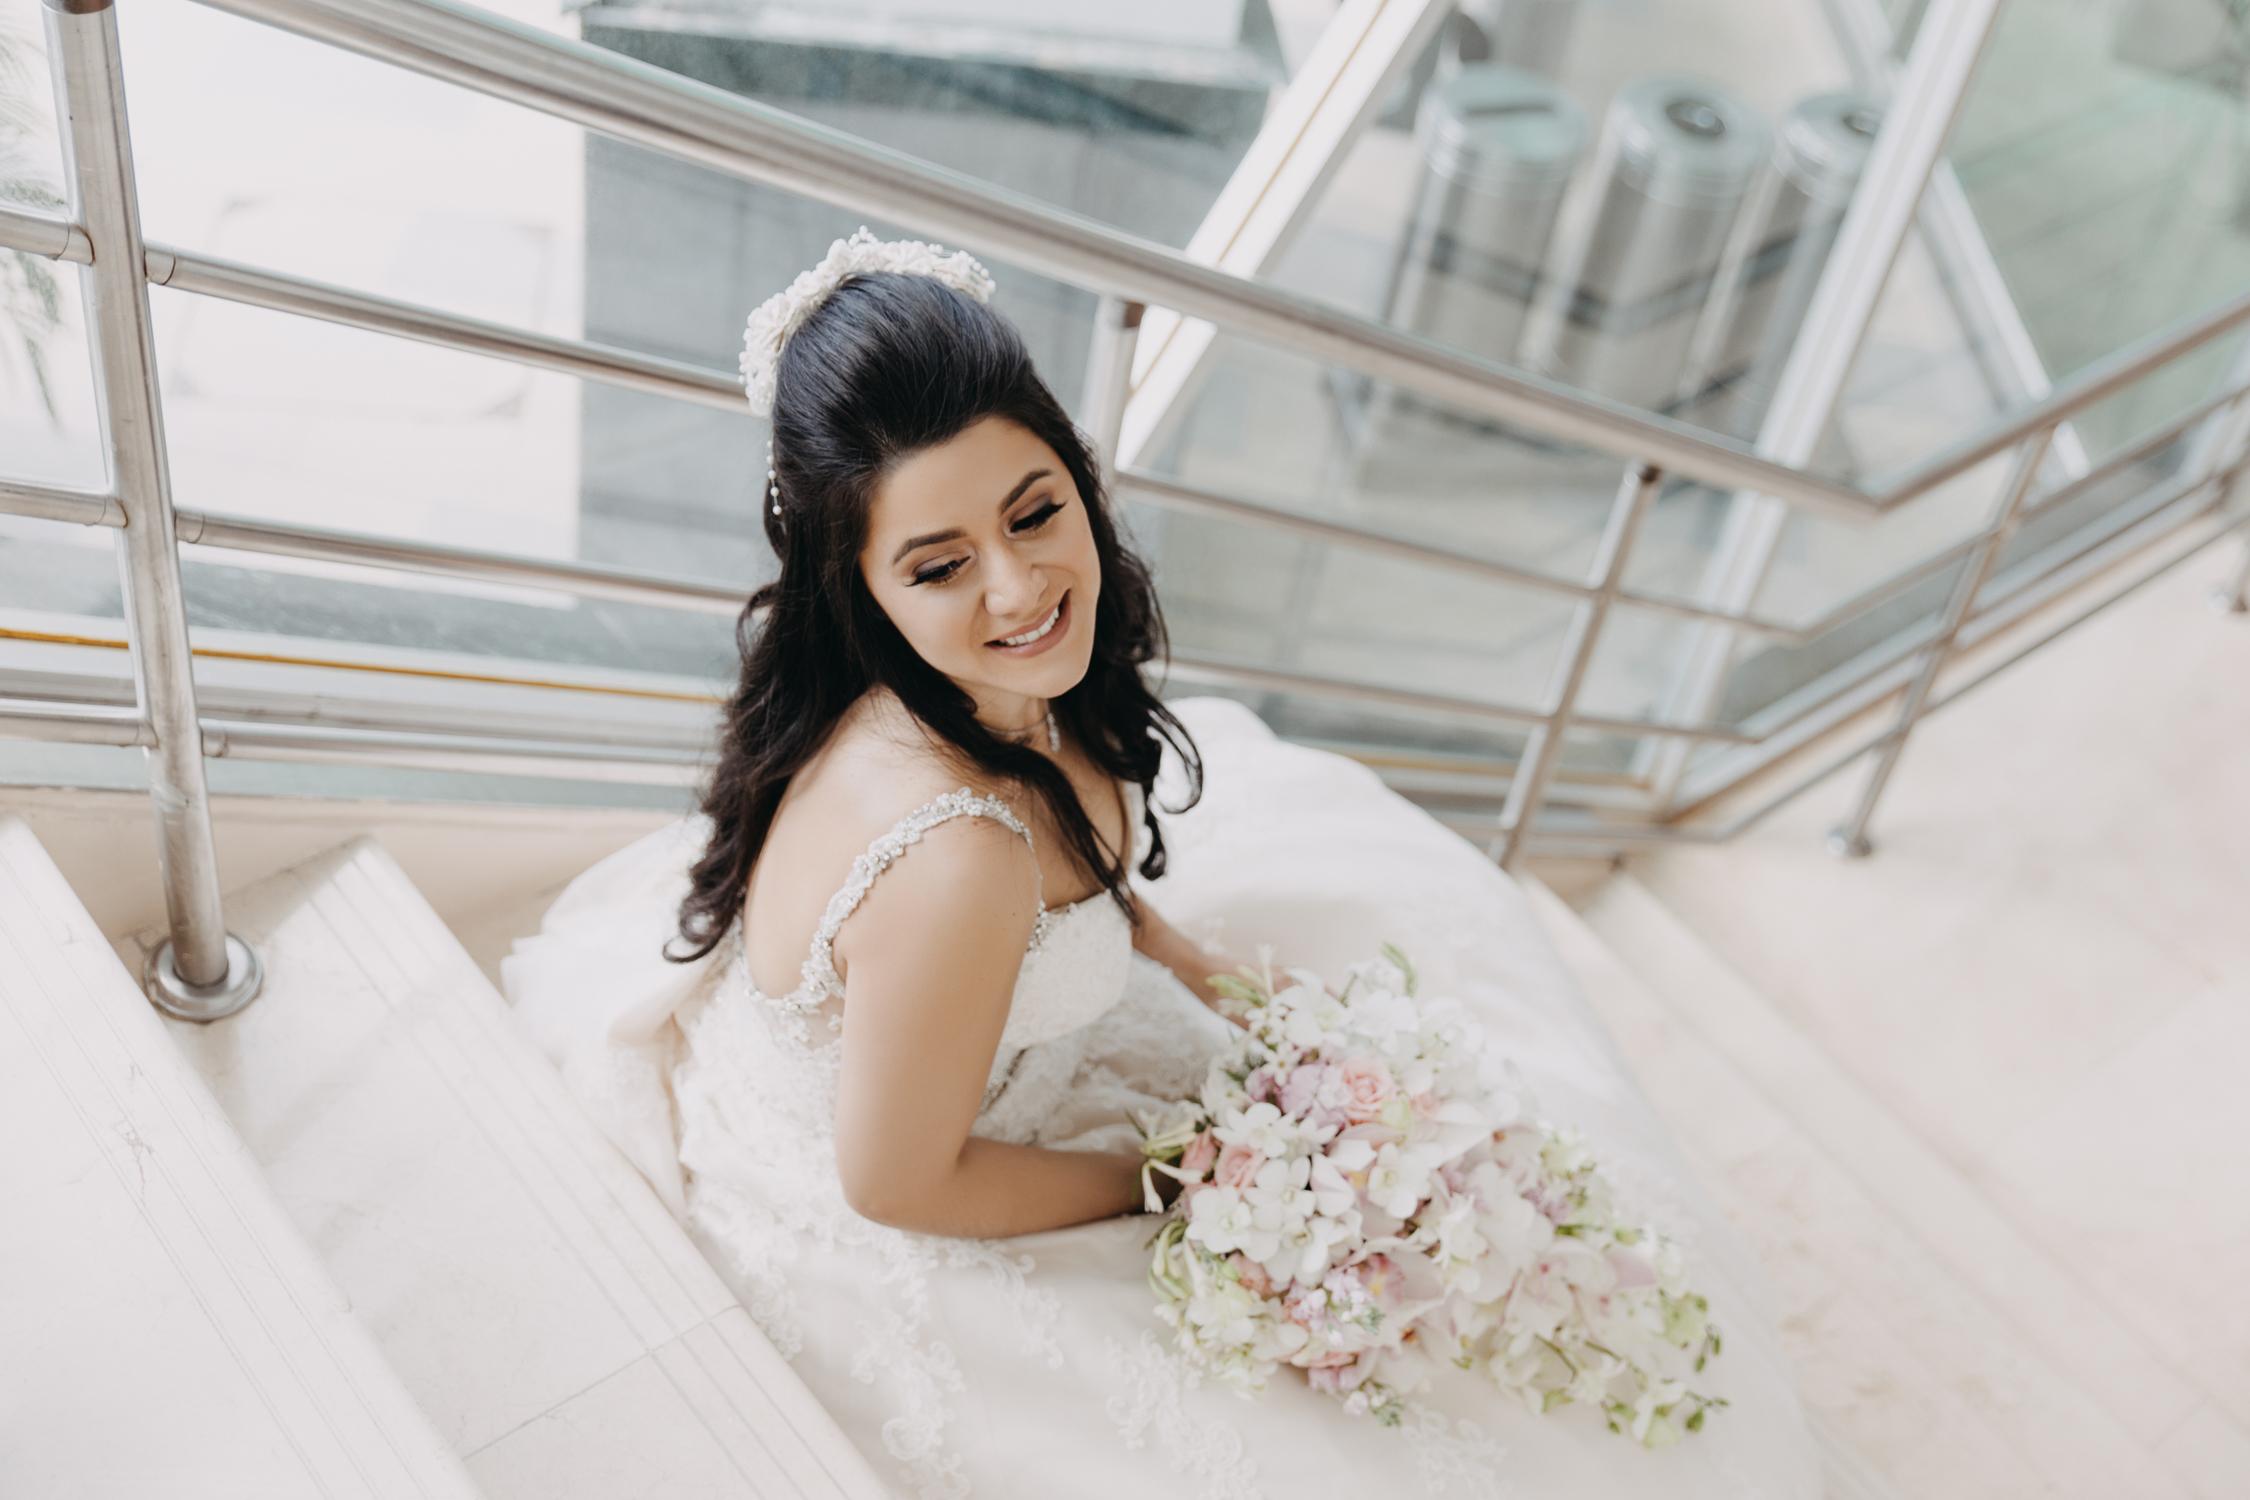 Michelle-Agurto-Fotografia-Bodas-Ecuador-Destination-Wedding-Photographer-Daniela-Dirk-85.JPG